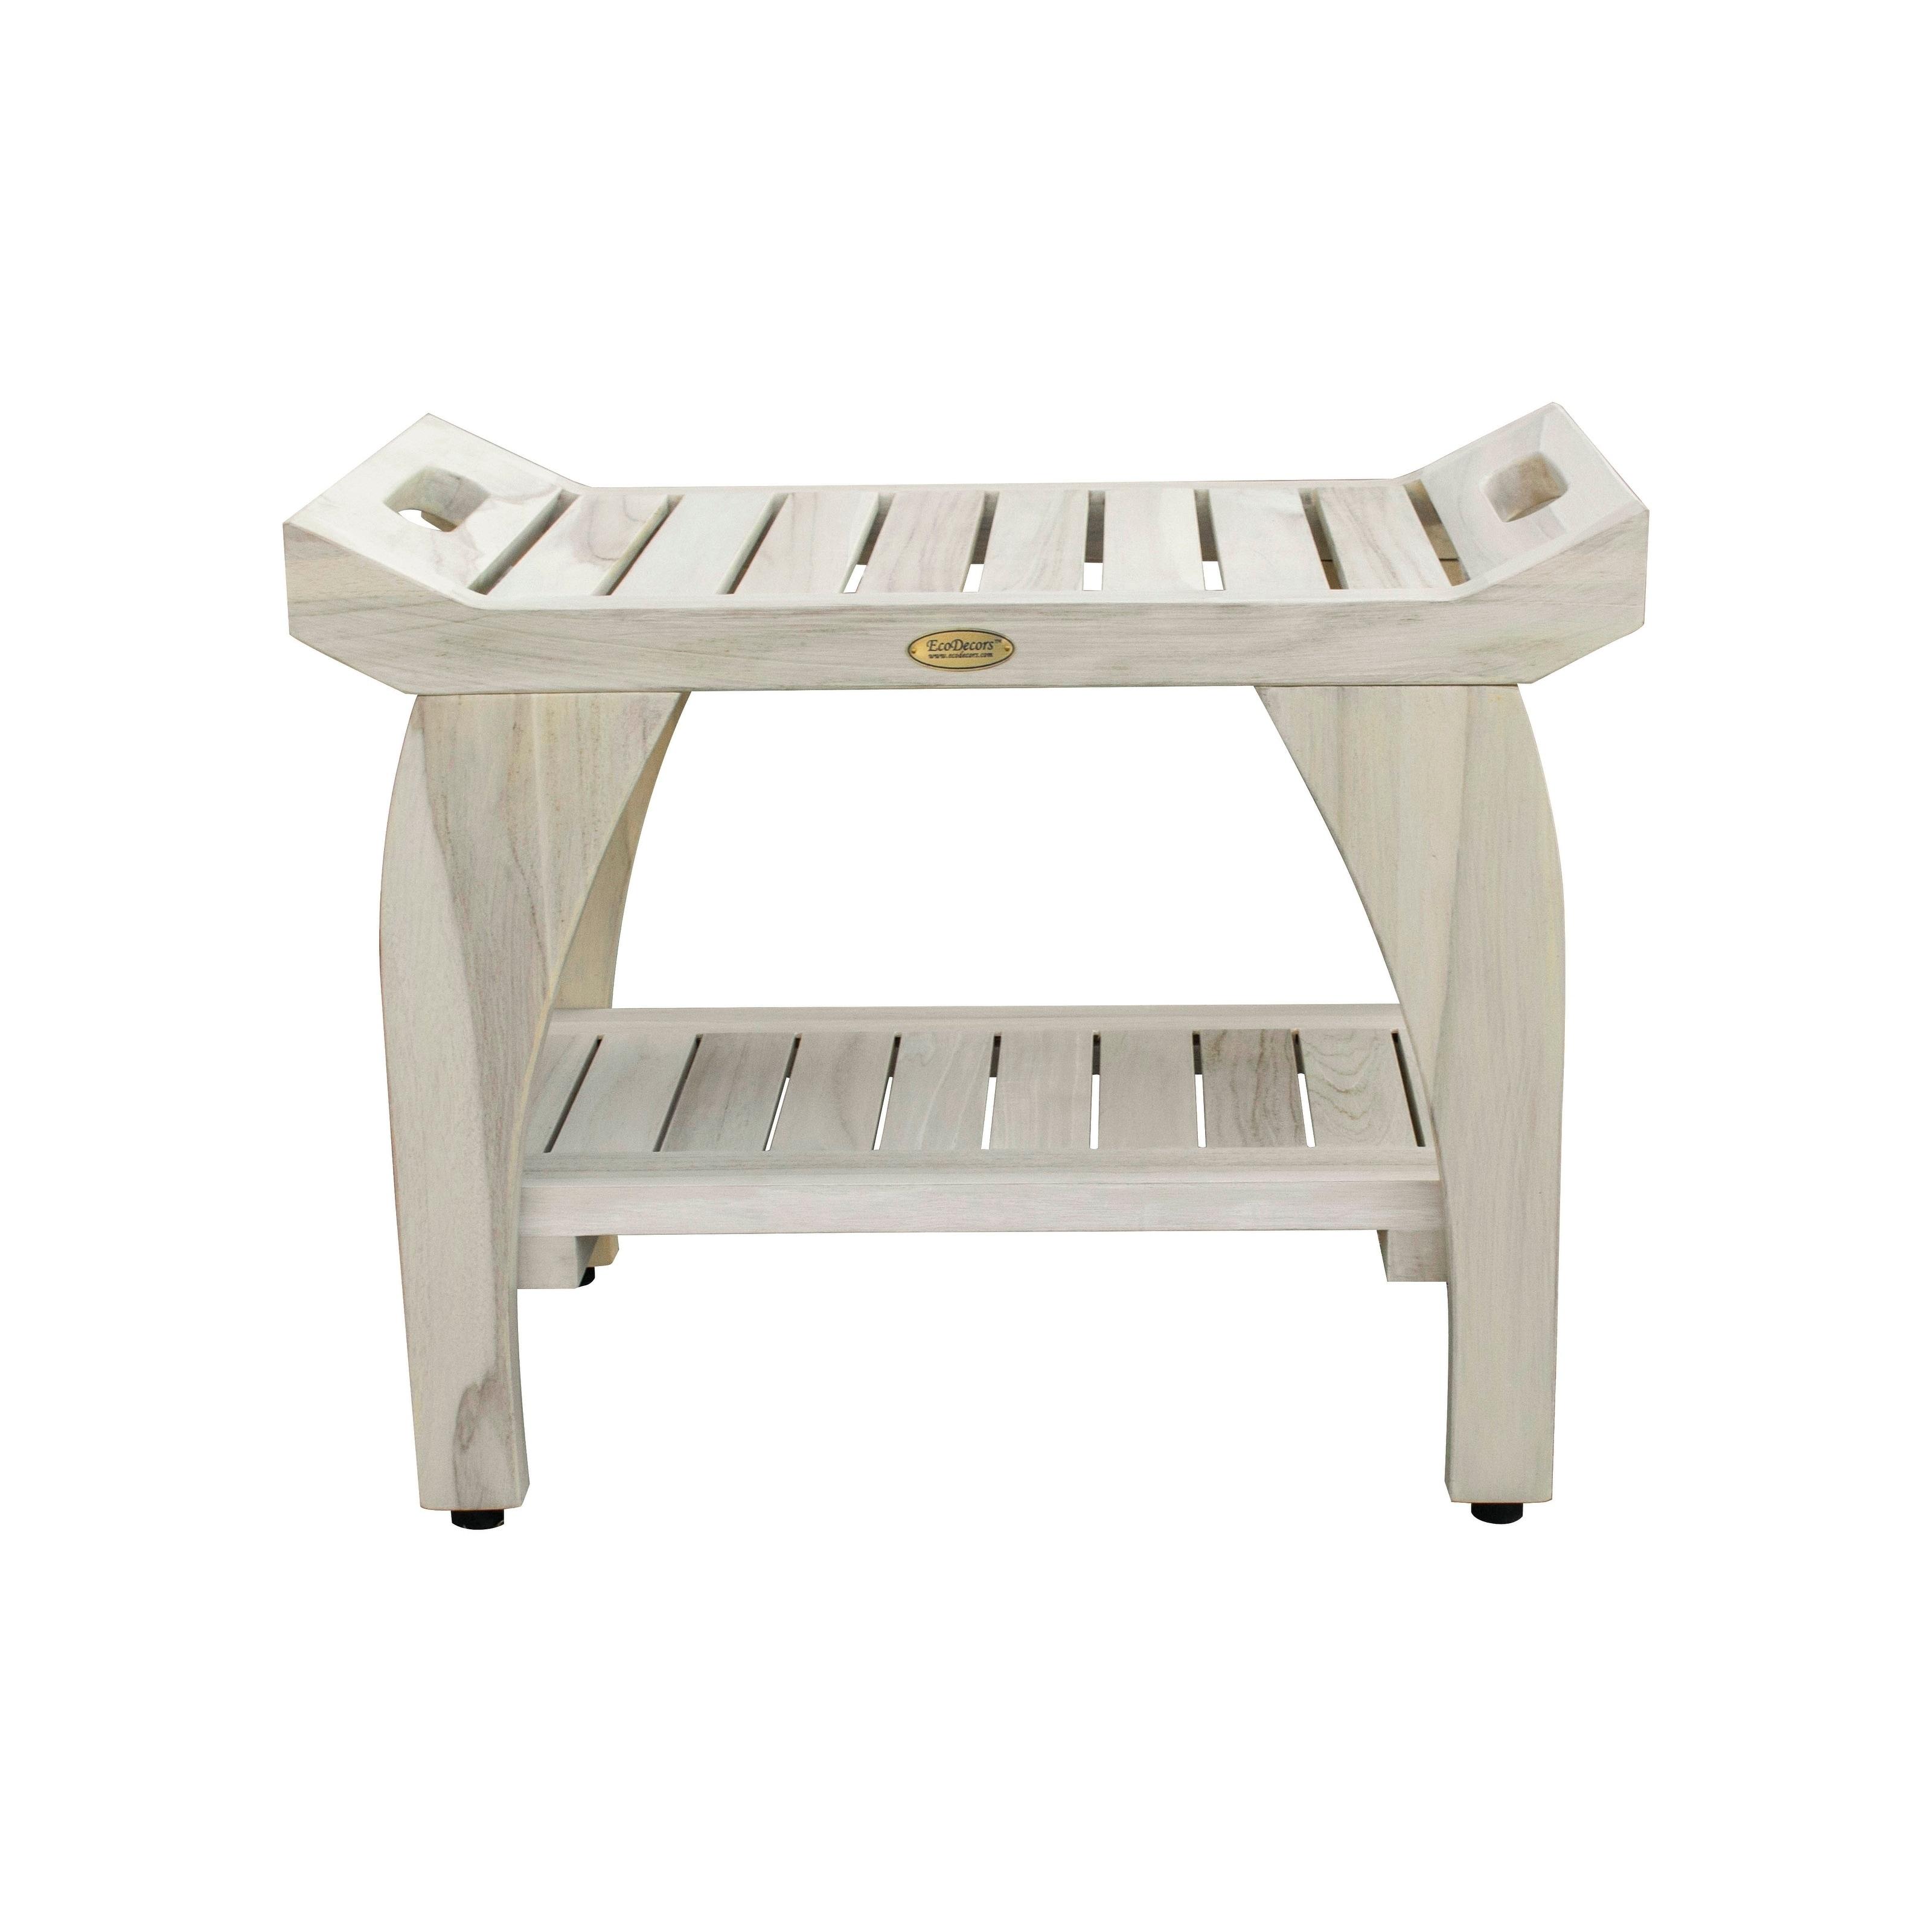 24 Coastalvogue Liftaide Tranquility Teak Shower Bench With Shelf Coastal Driftwood Overstock 28300989